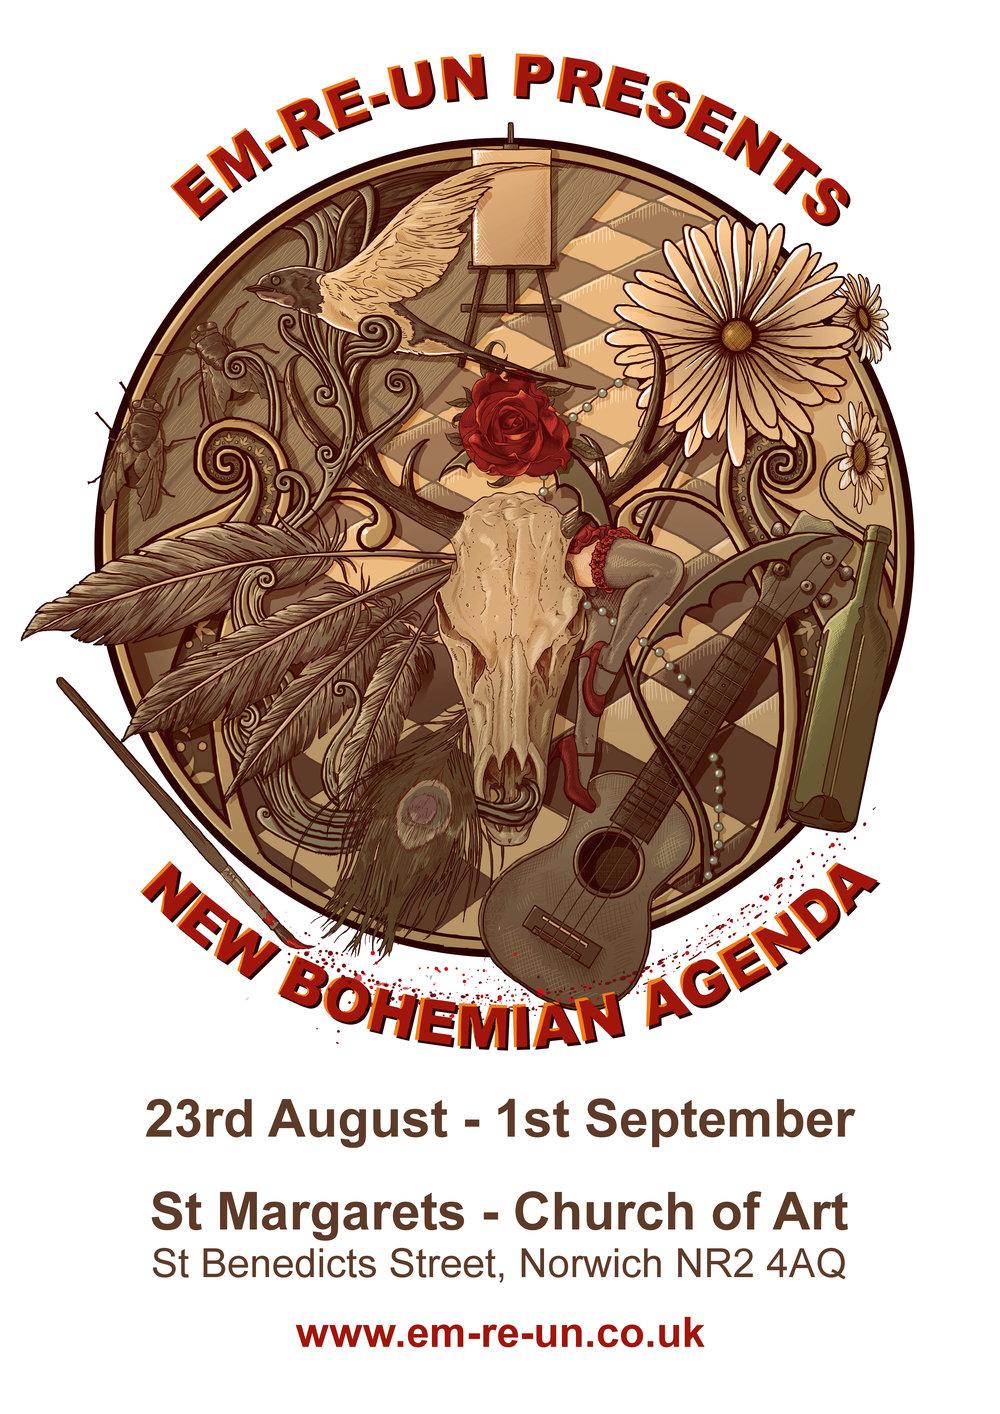 New Bohemian Bohemian Agenda leaflet side1.jpg